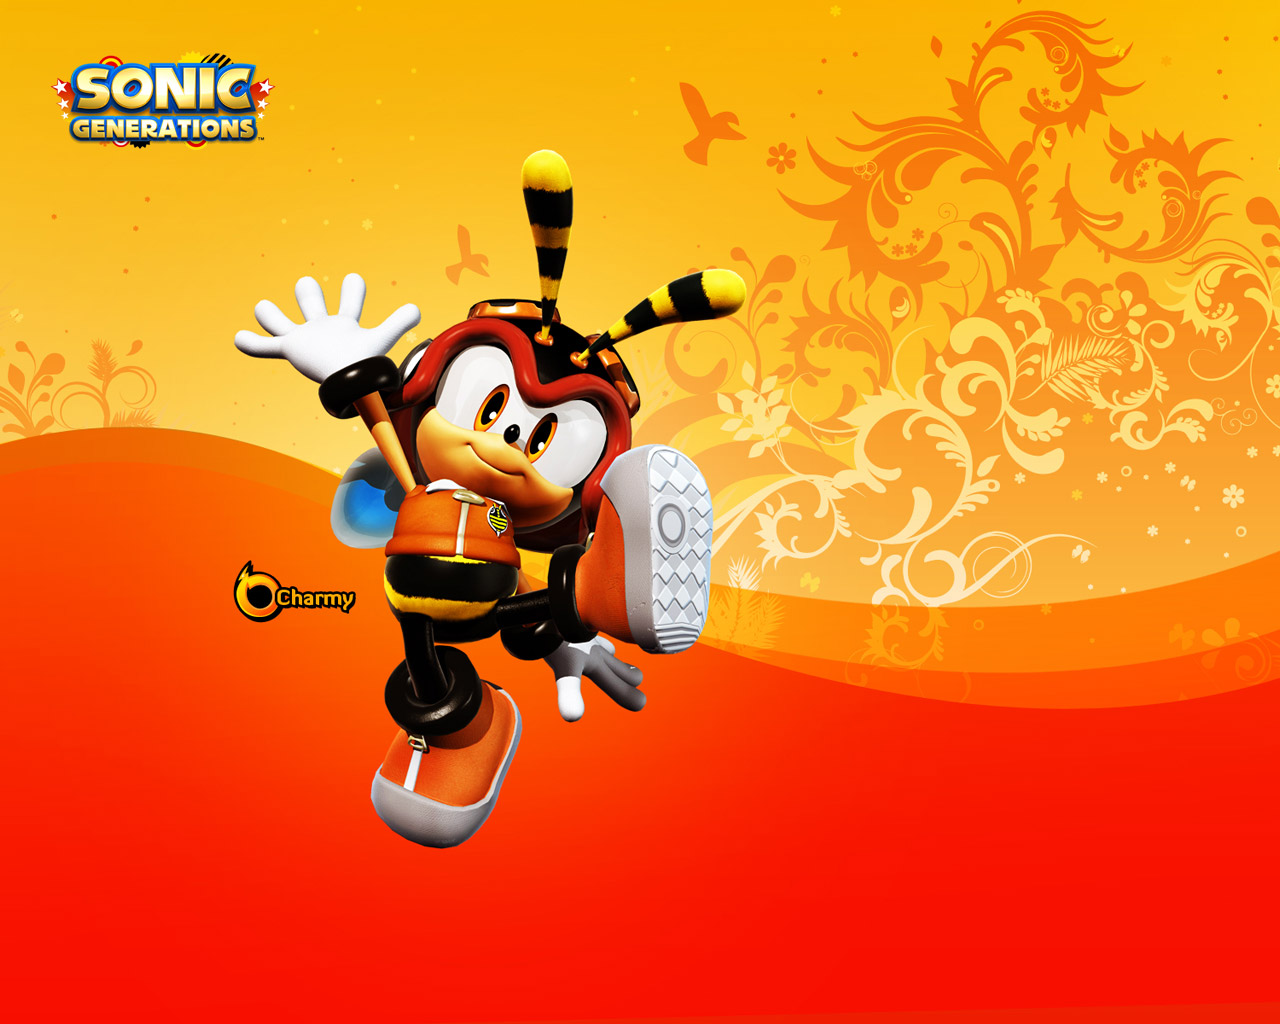 Sonic Generations Wallpaper in 1280x1024